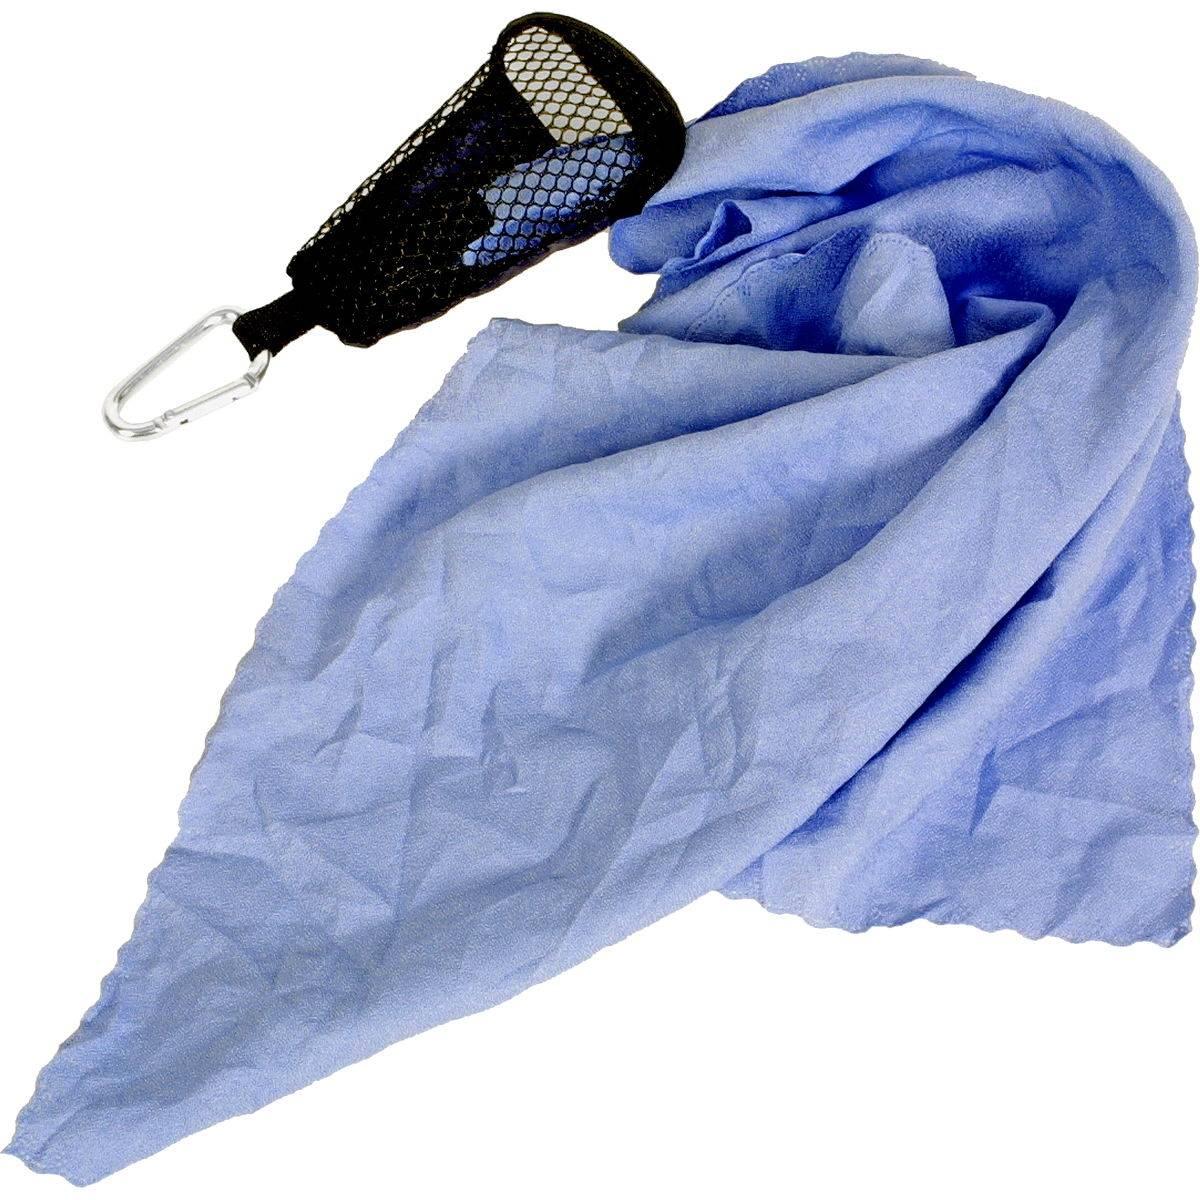 Relags Mini Handtuch - Bild 2